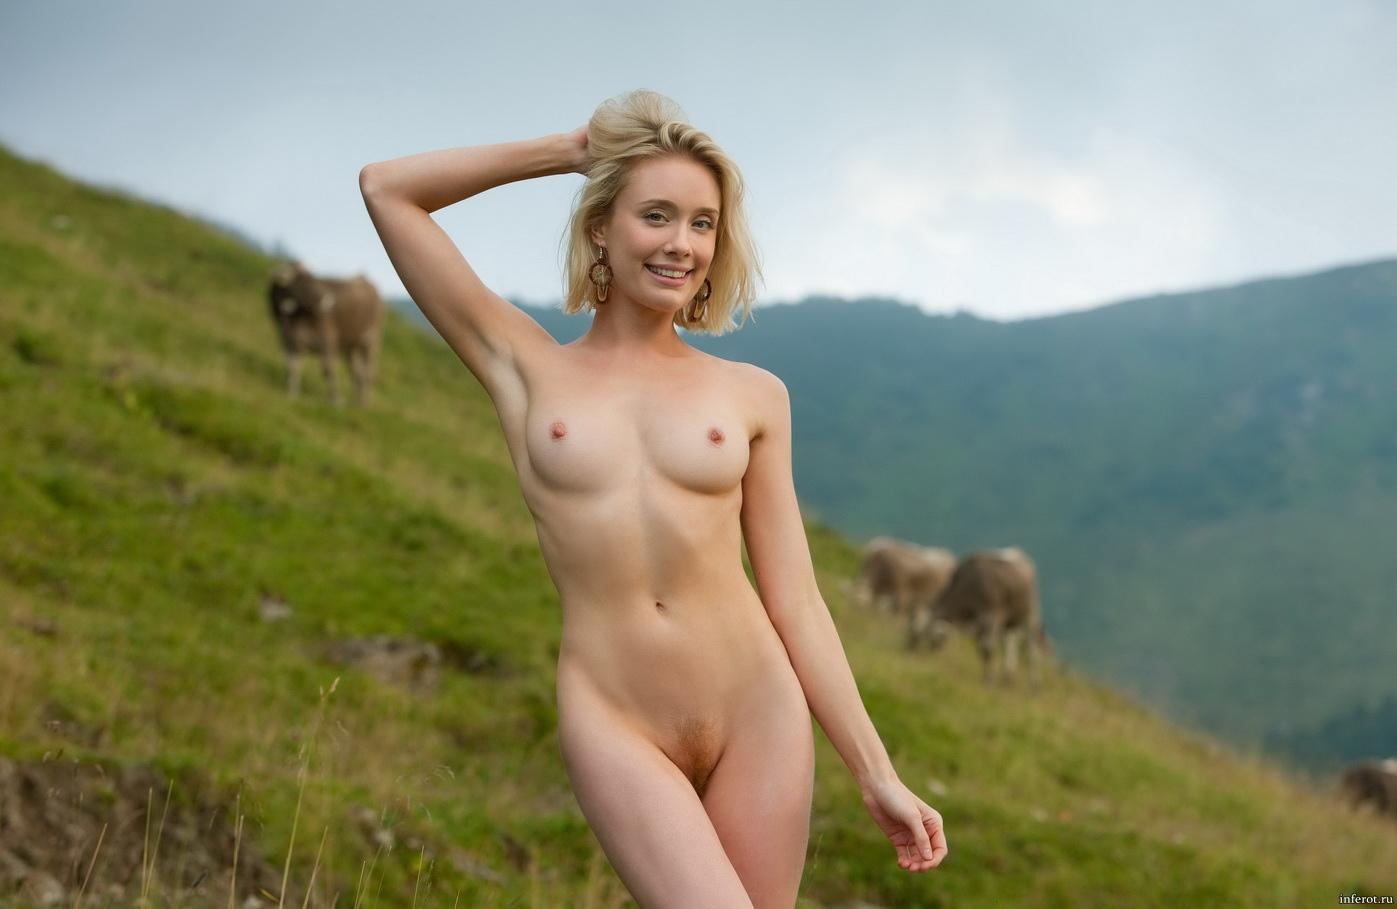 weddings-lehigh-valley-naked-girls